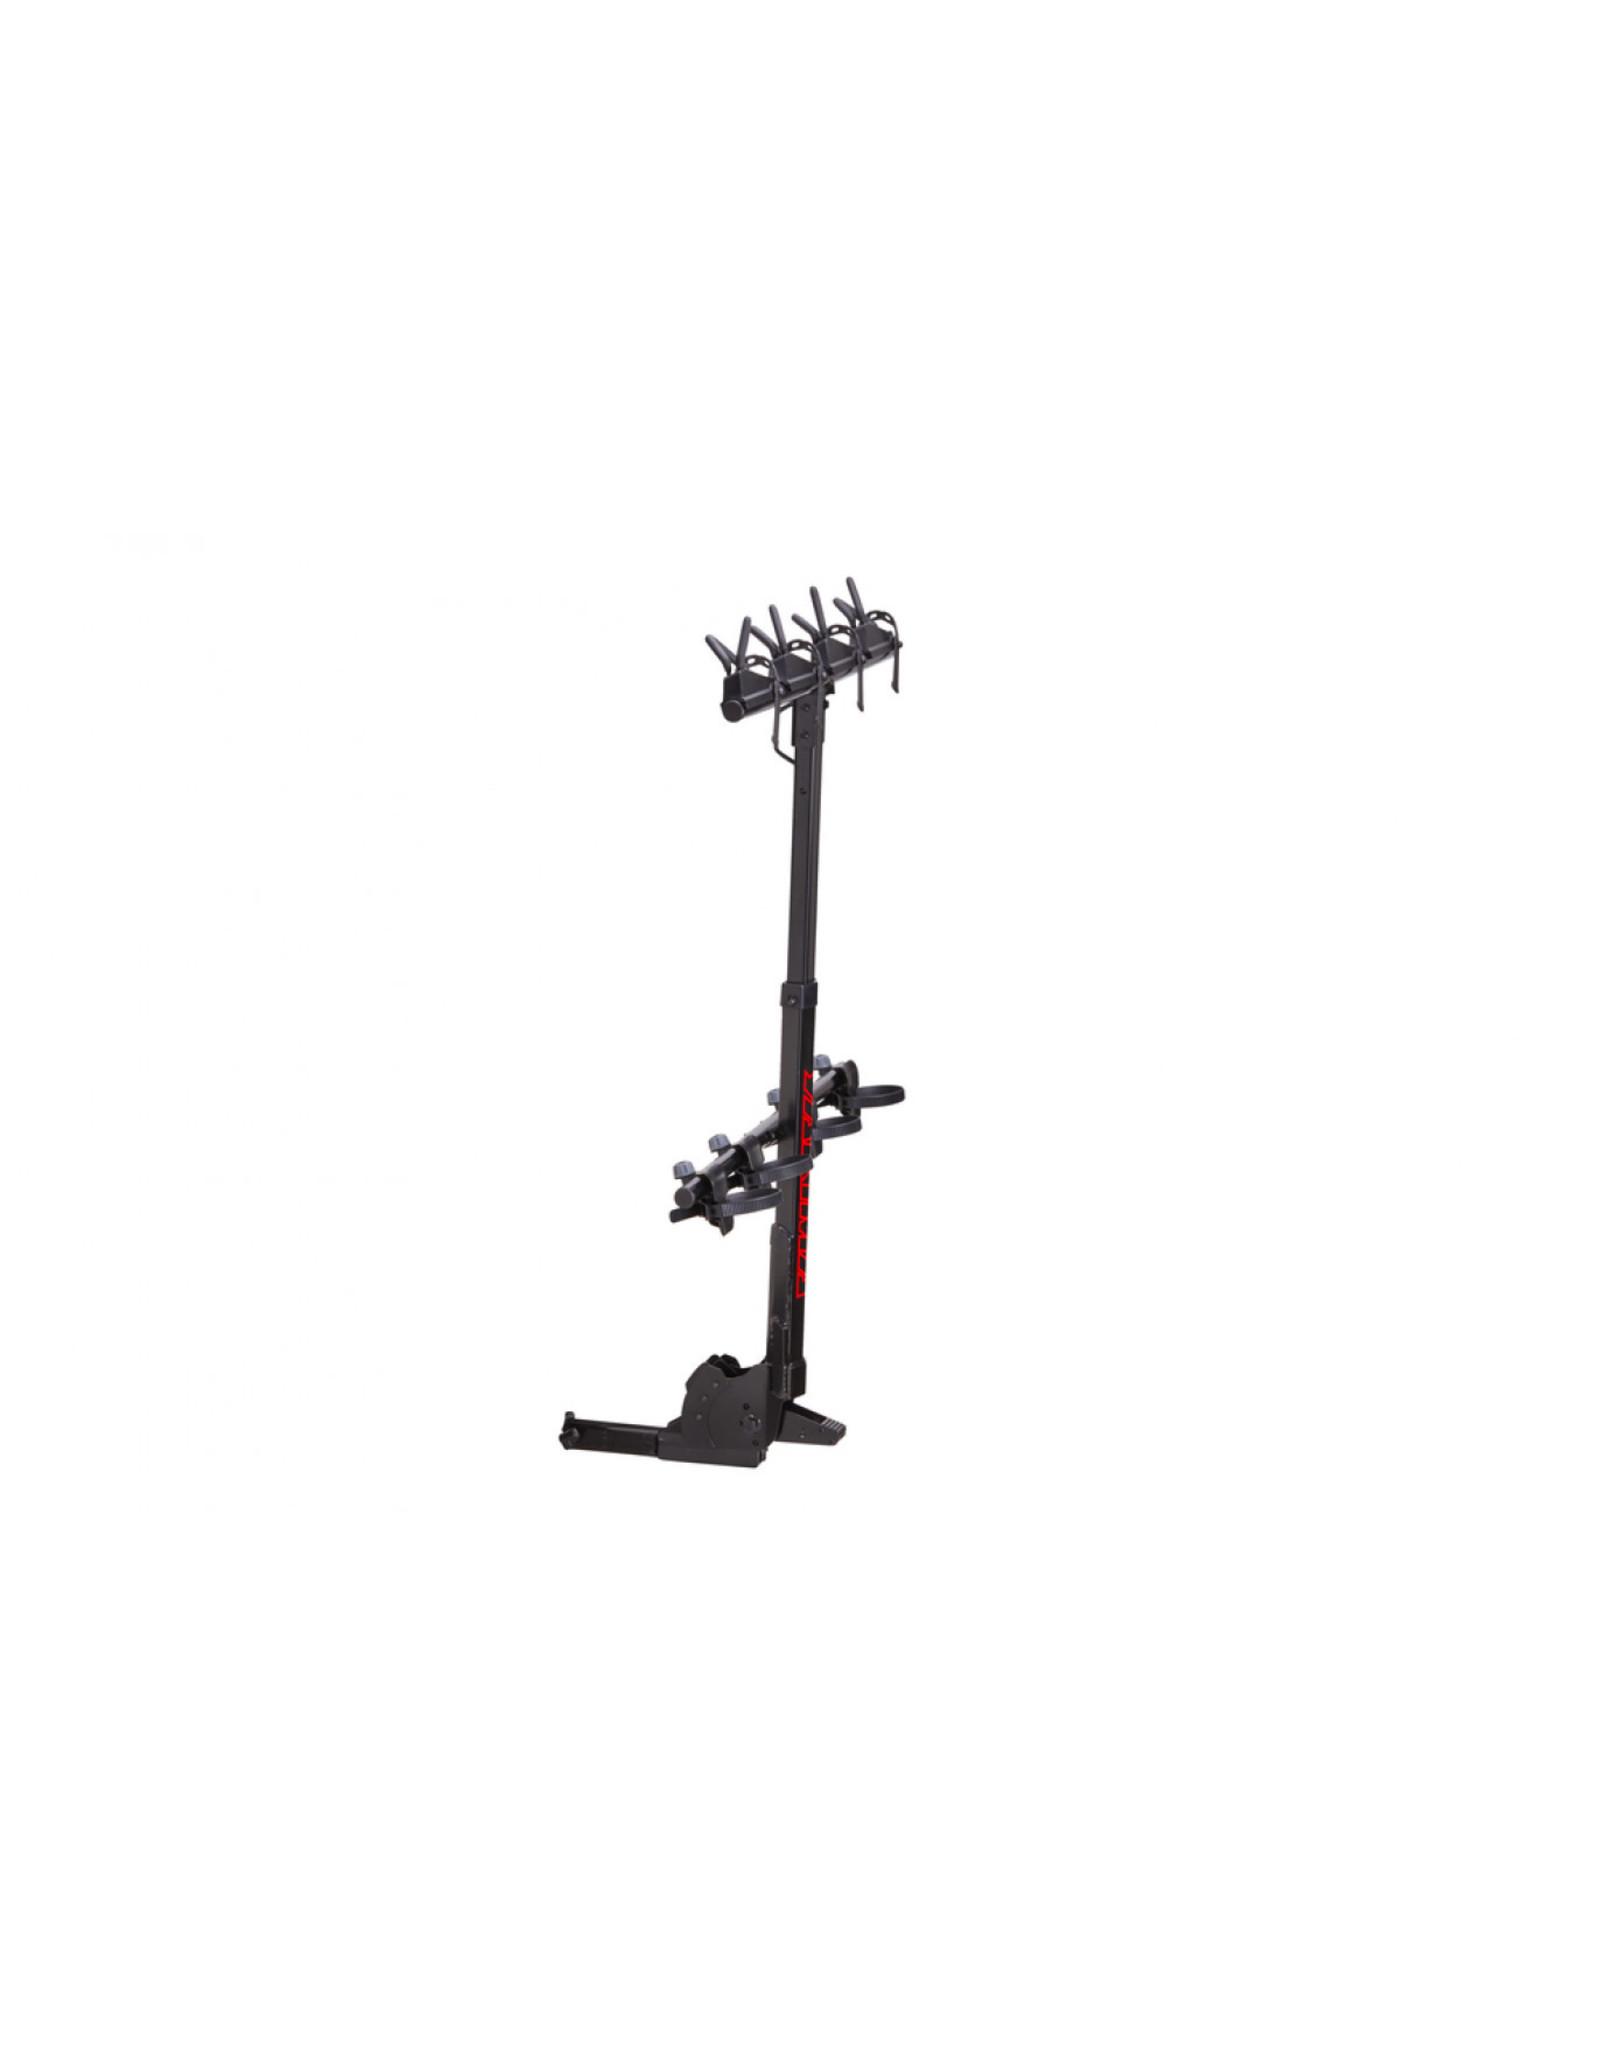 YAKIMA YAKIMA - HangOver Vertical Hanging Mountain Bike Rack (4 bikes)